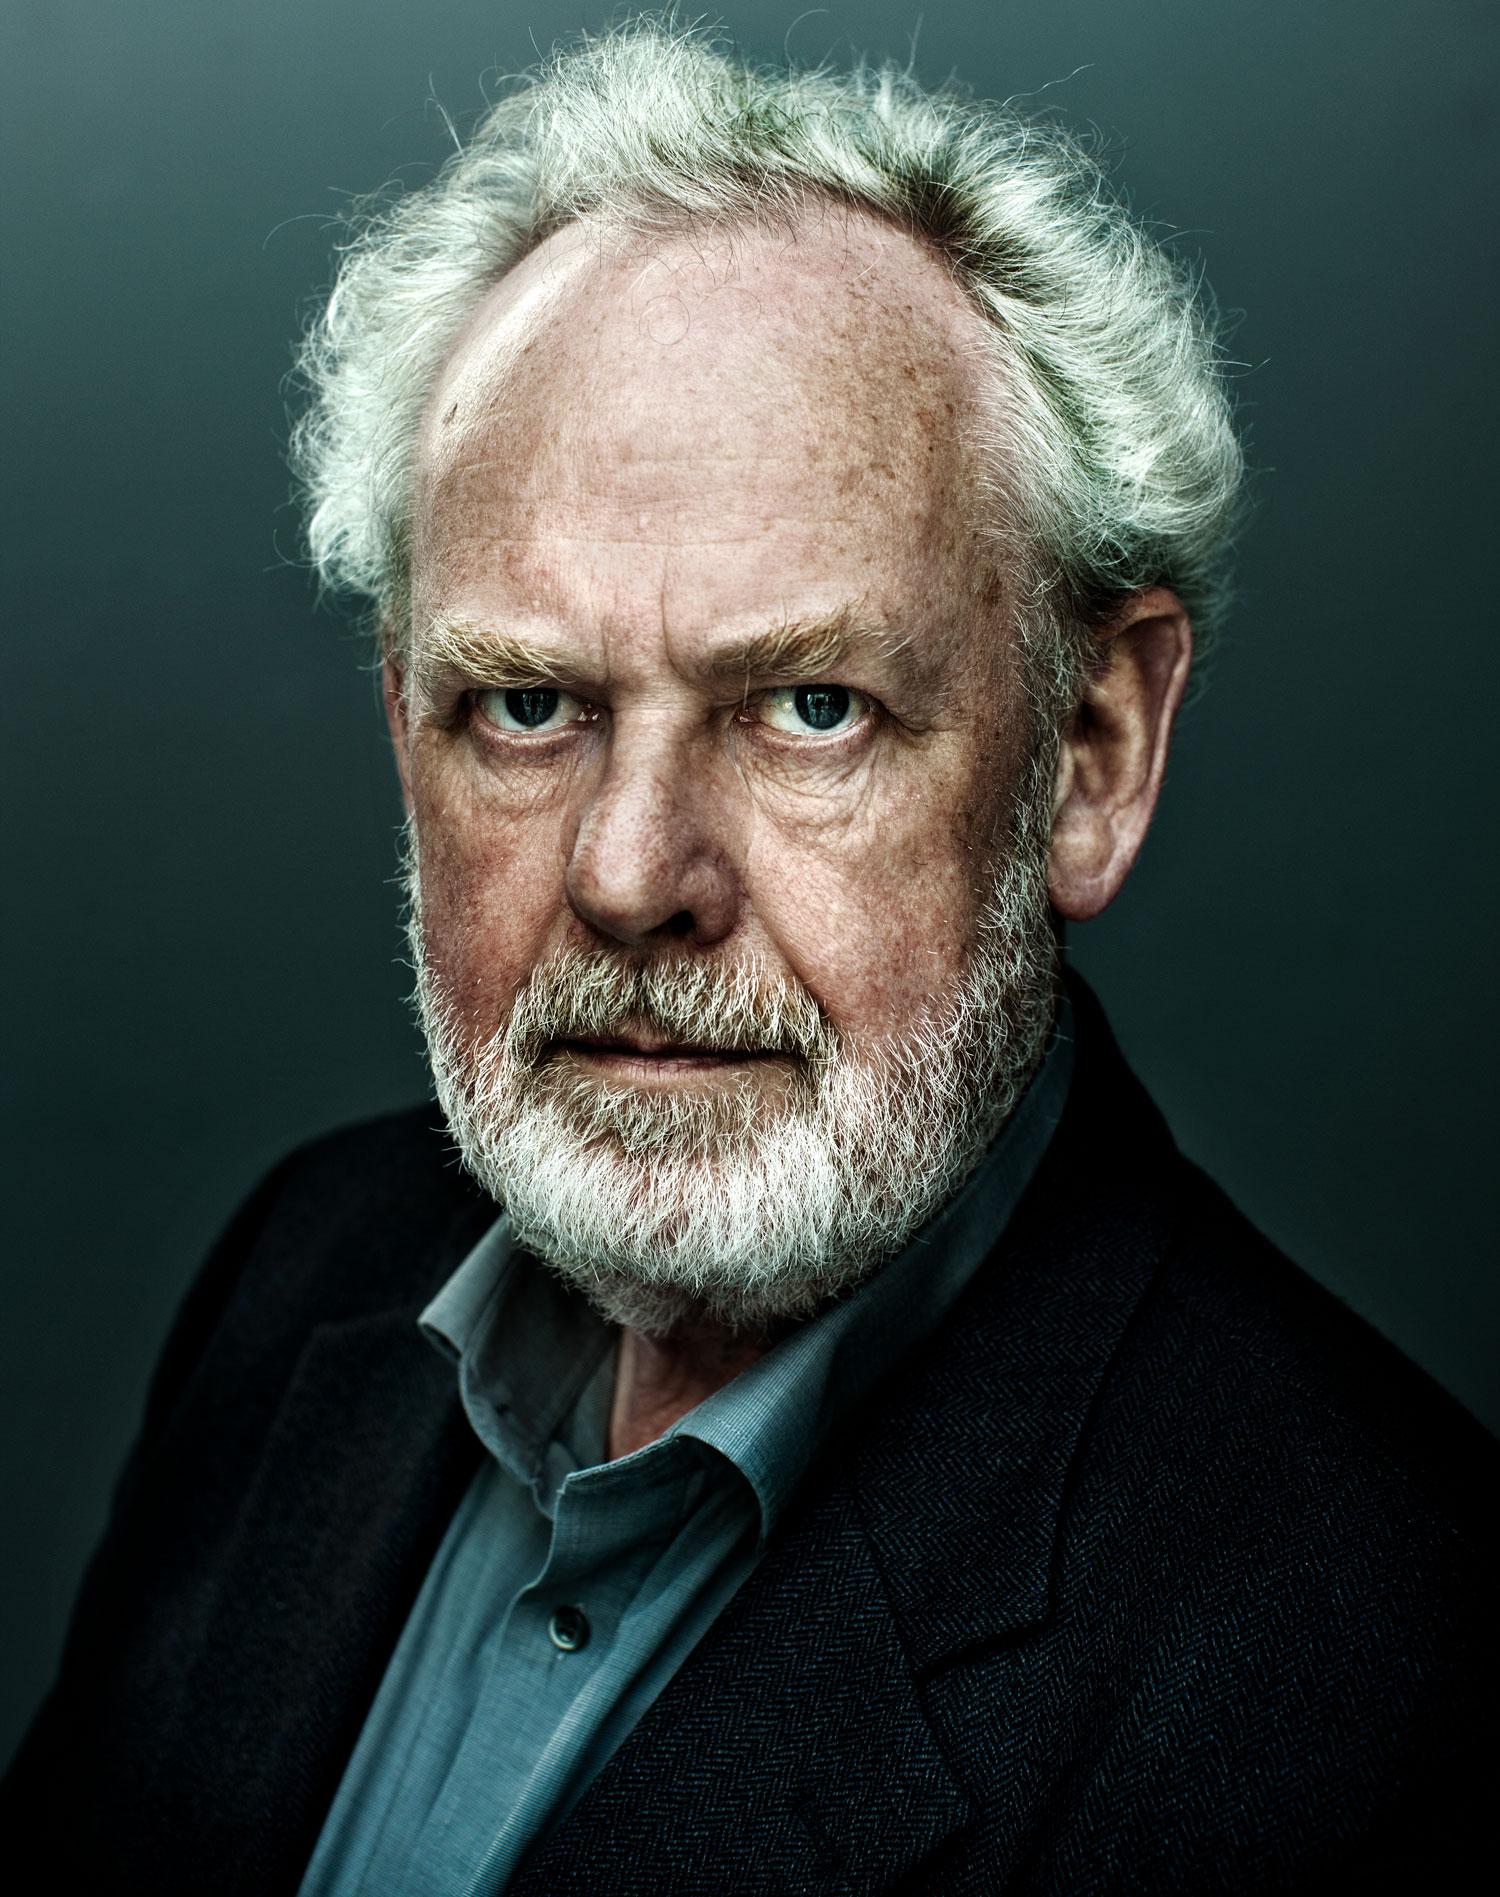 Author, Jens Smaerup Soerensen